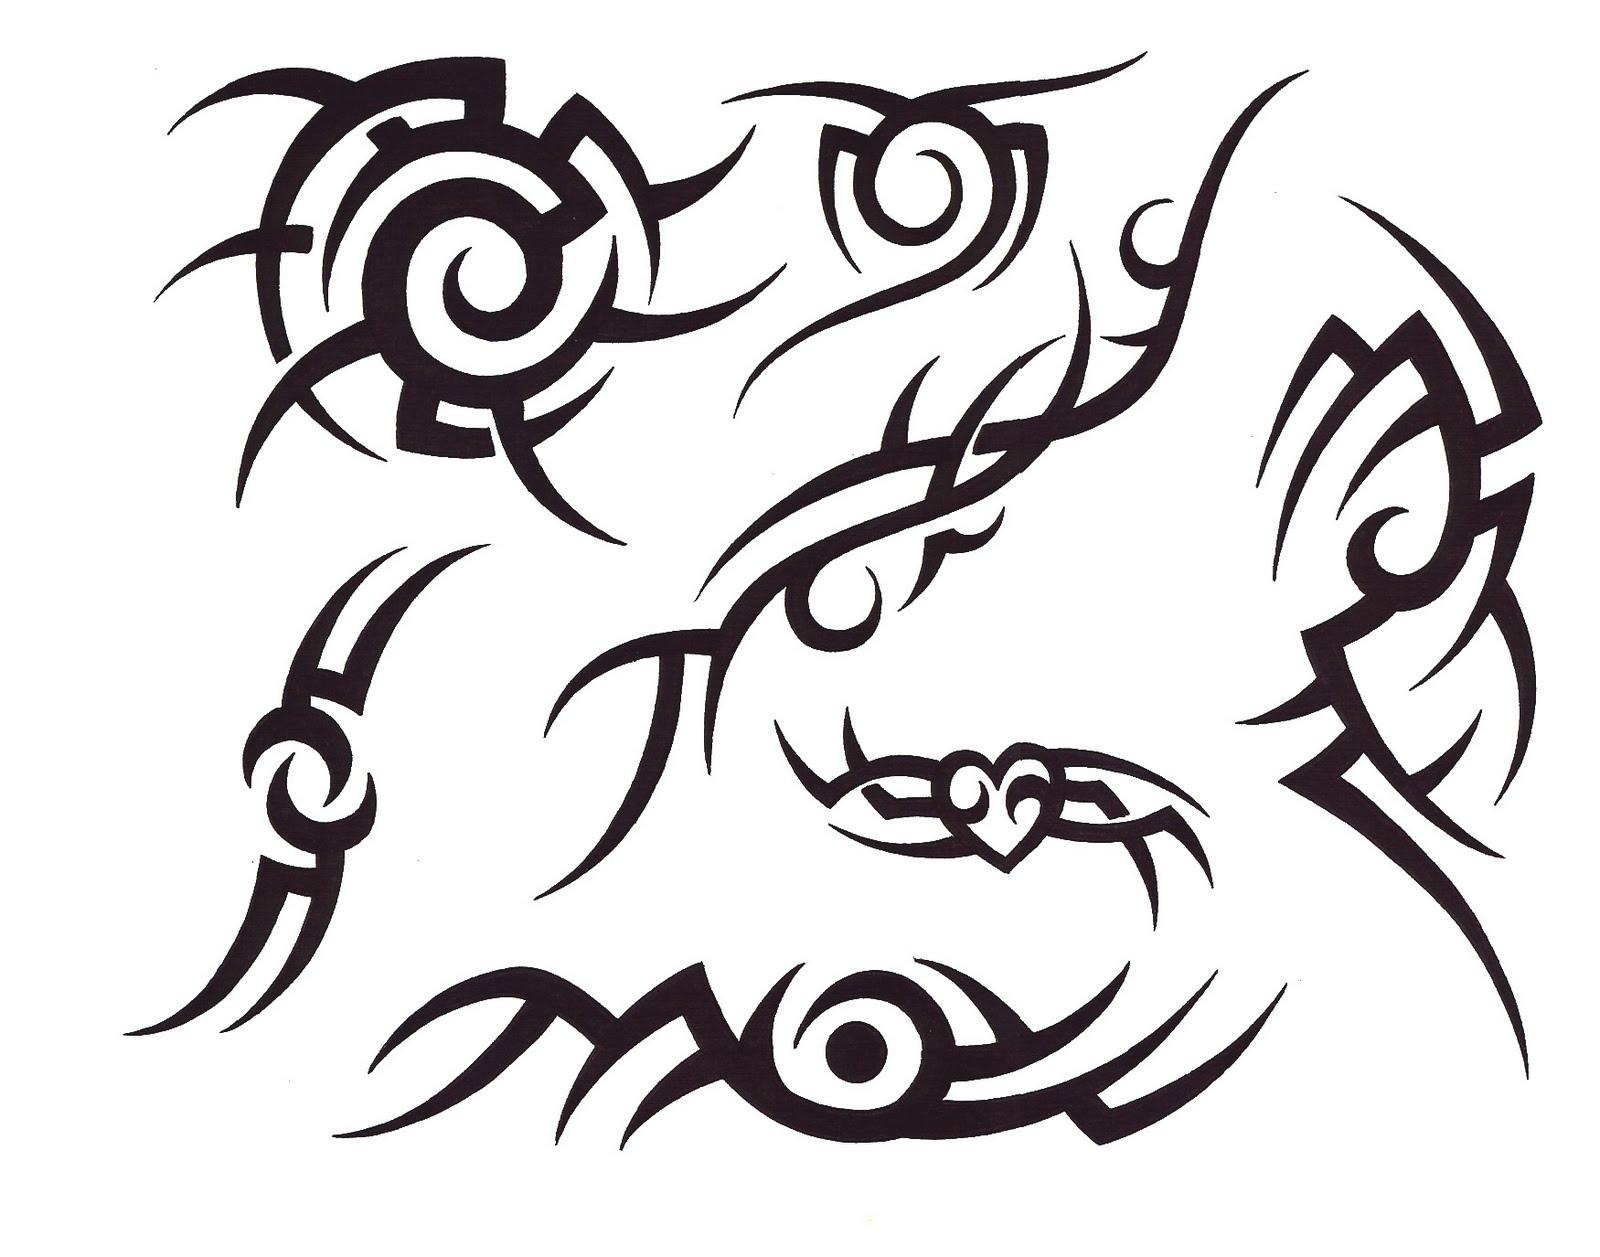 http://4.bp.blogspot.com/_1eqZ2PvXg3c/S9YyPJfDkLI/AAAAAAAAKL8/kWjBEElHnKw/s1600/tribal-tattoo-014.JPG